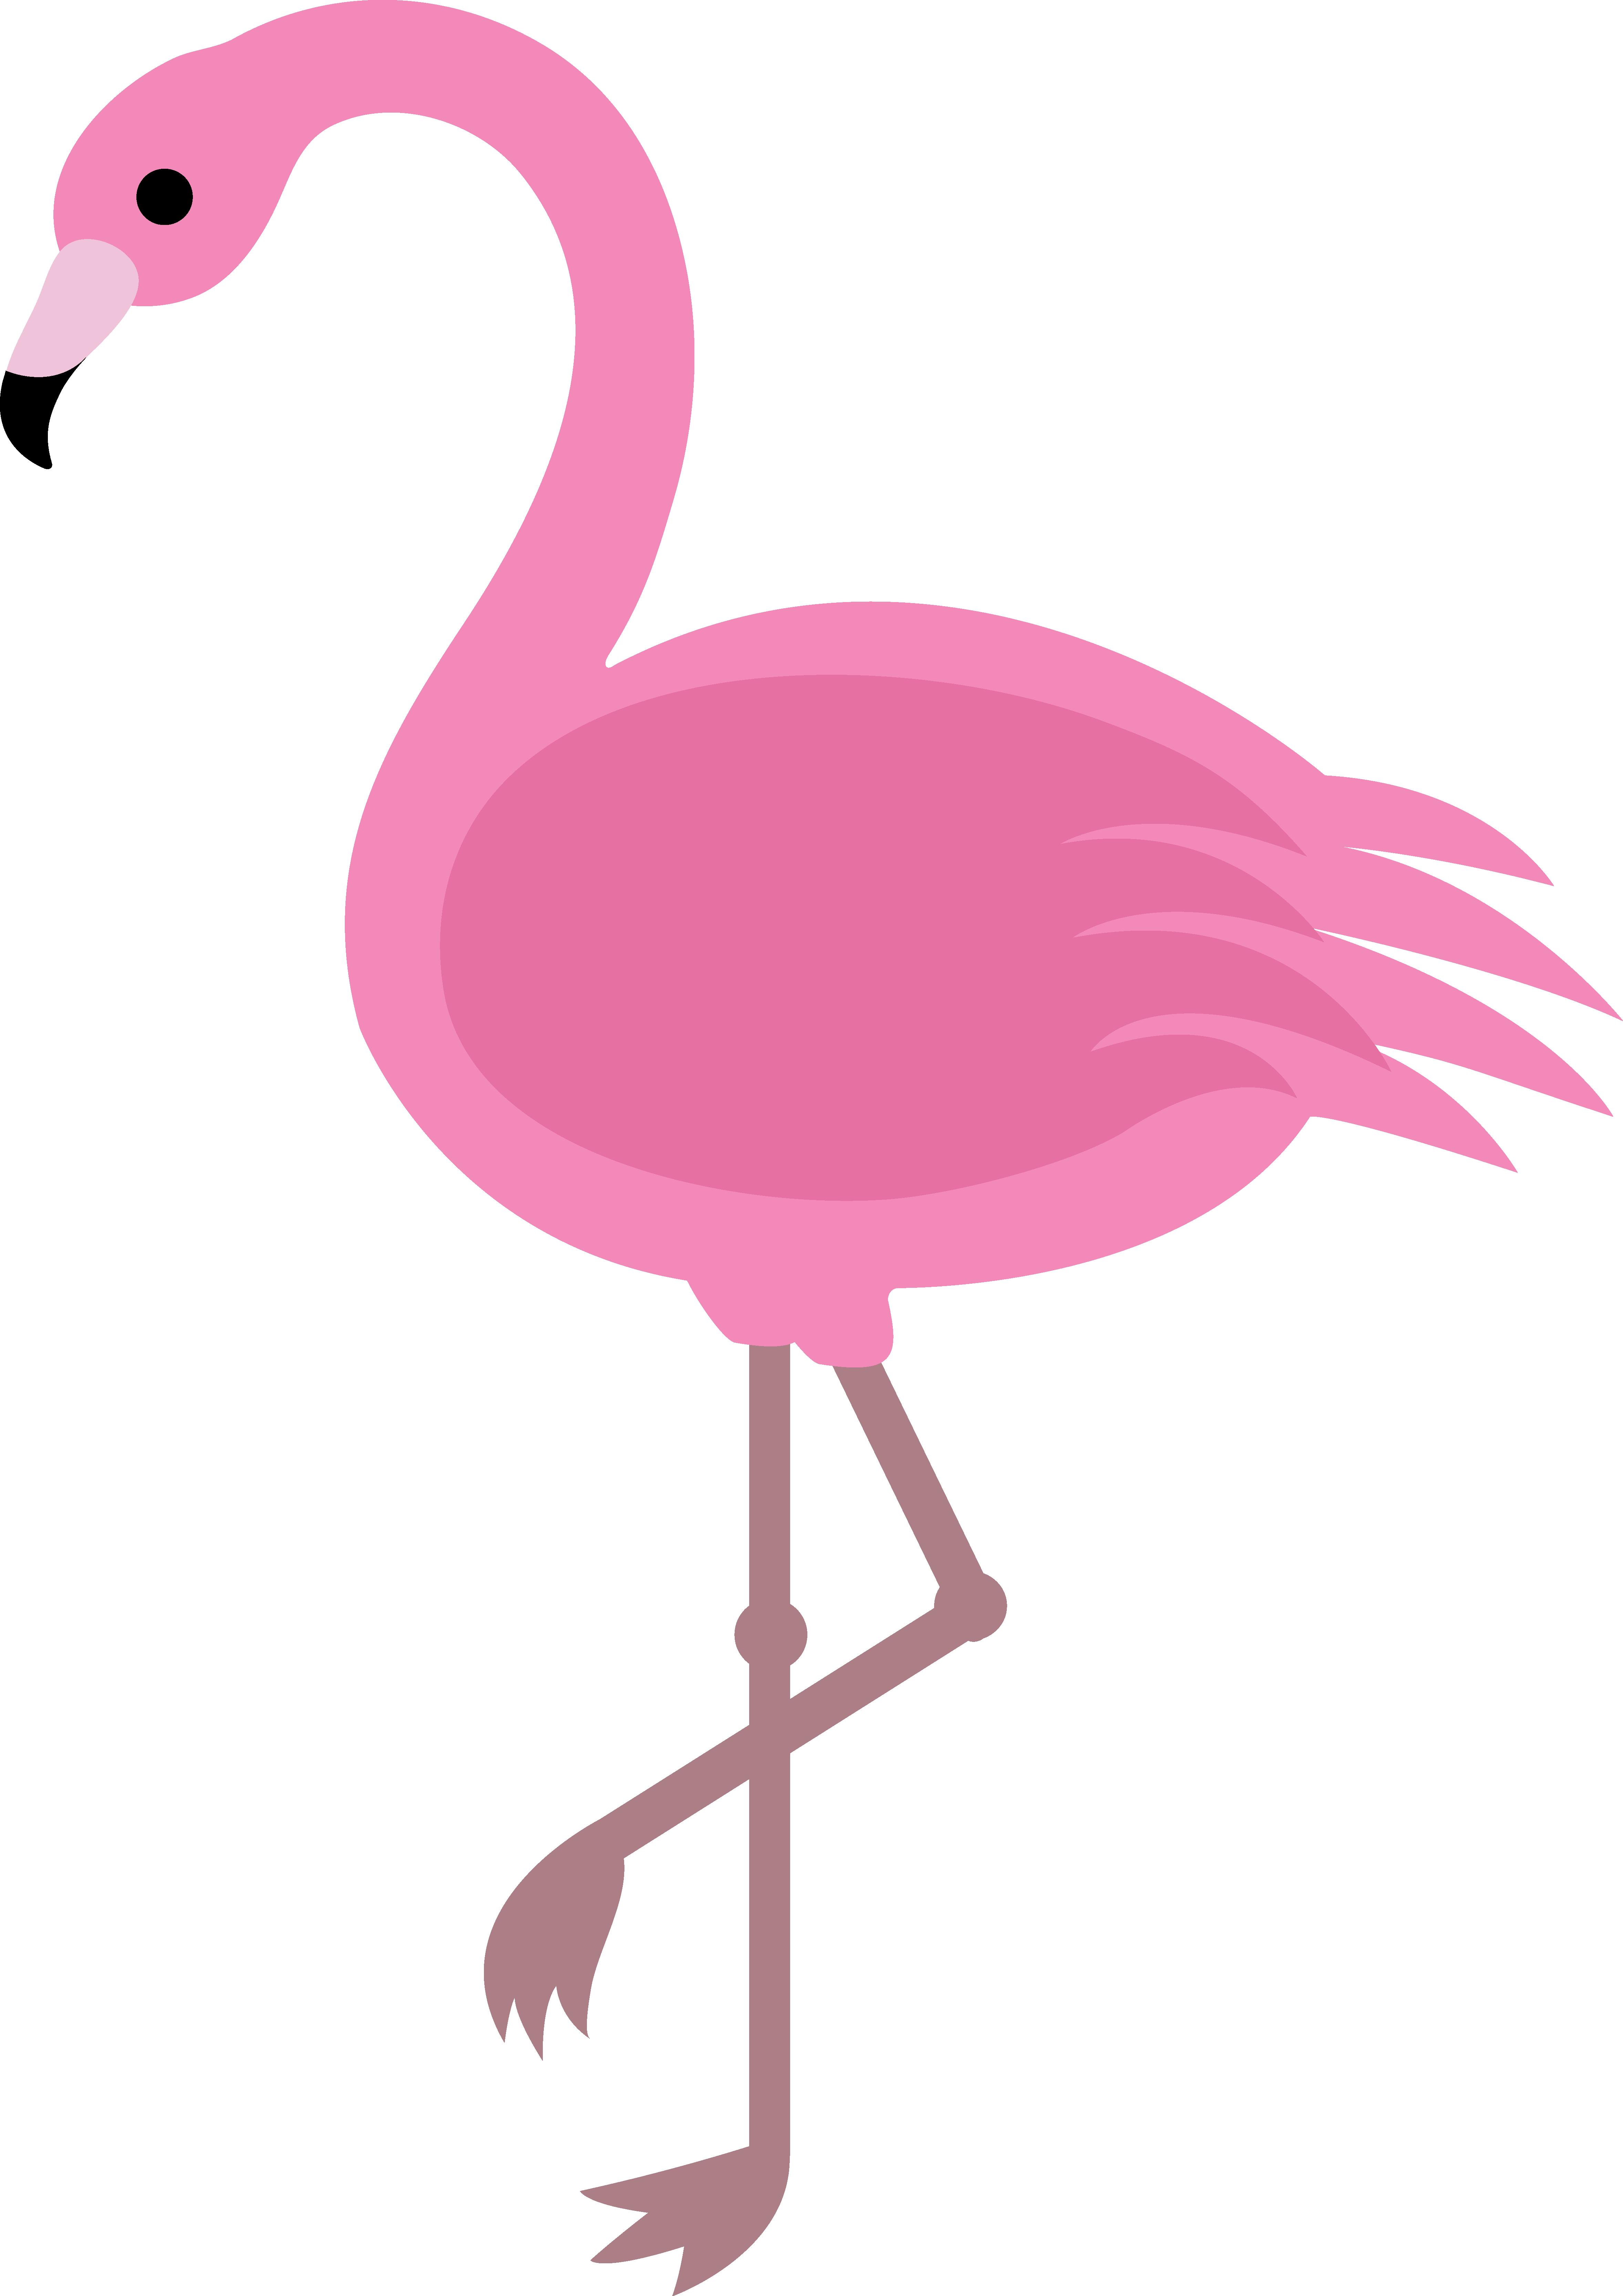 Foot clipart flamingo. Pin by tutoriales belen